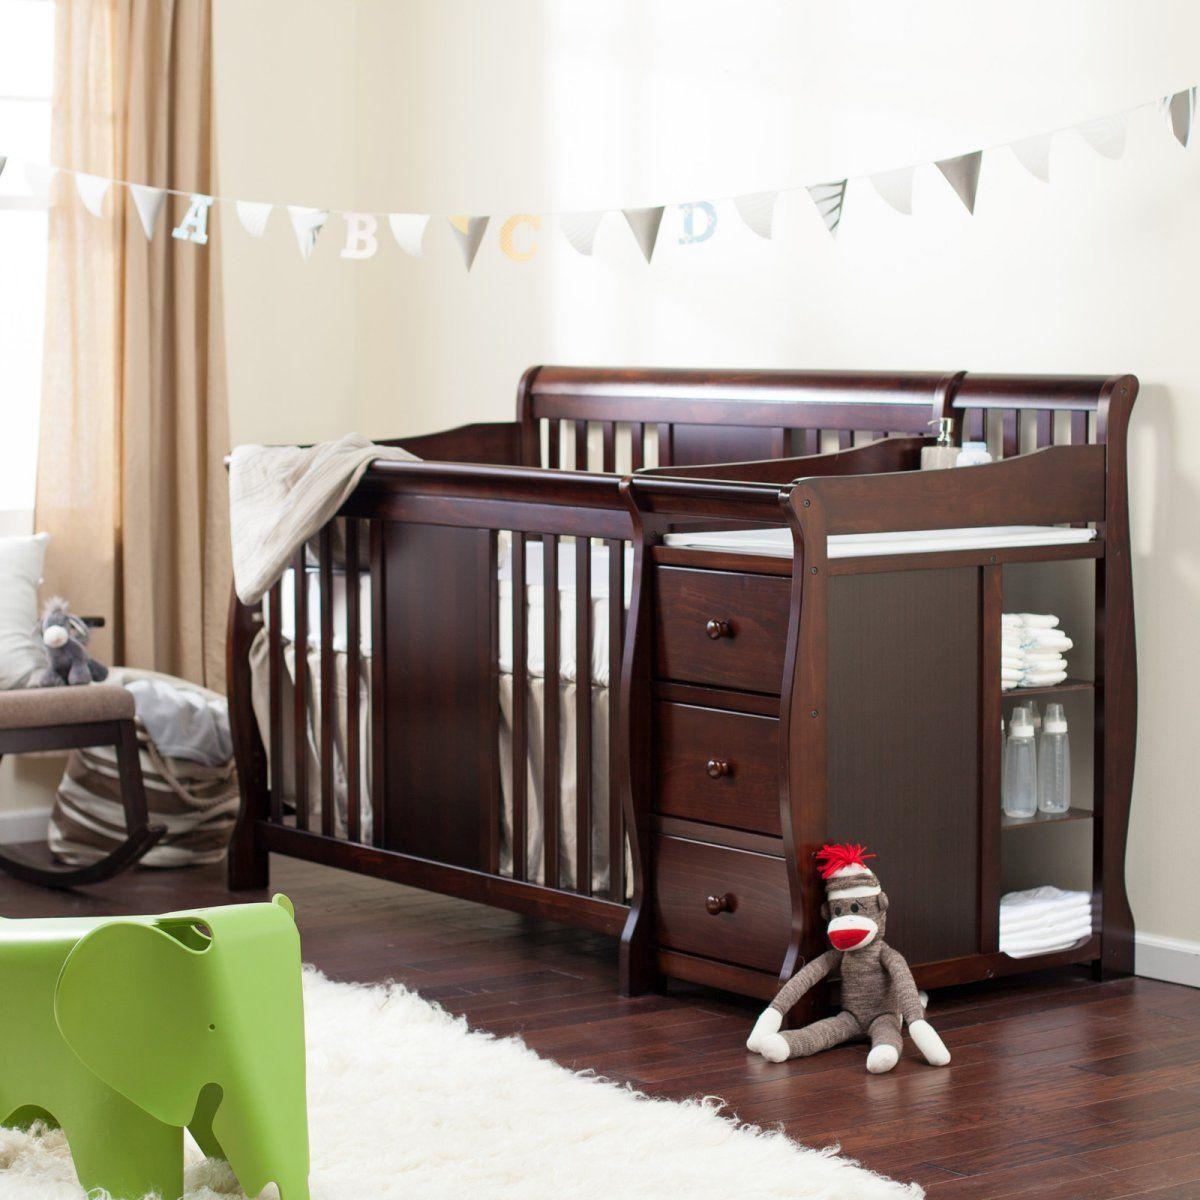 Hayneedle Exclusive - Storkcraft Calabria Crib N Changer - Nursery ...